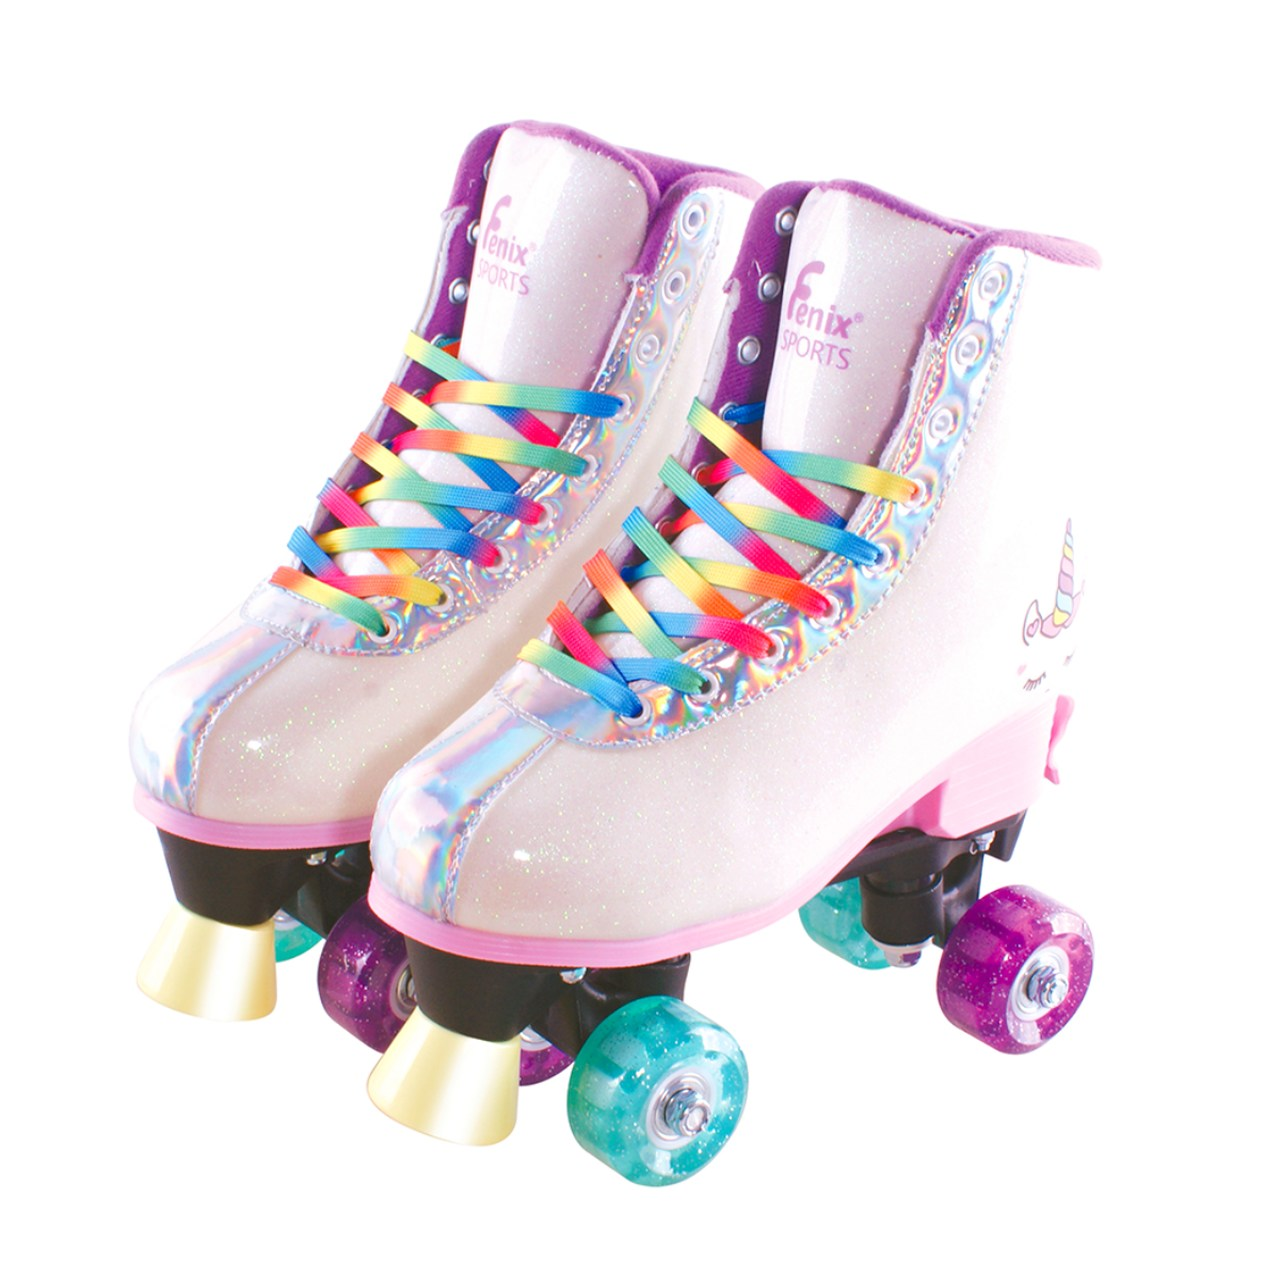 Patins Roller Skate 4 Rodas Ajustável C/luz Unicórnio Fenix